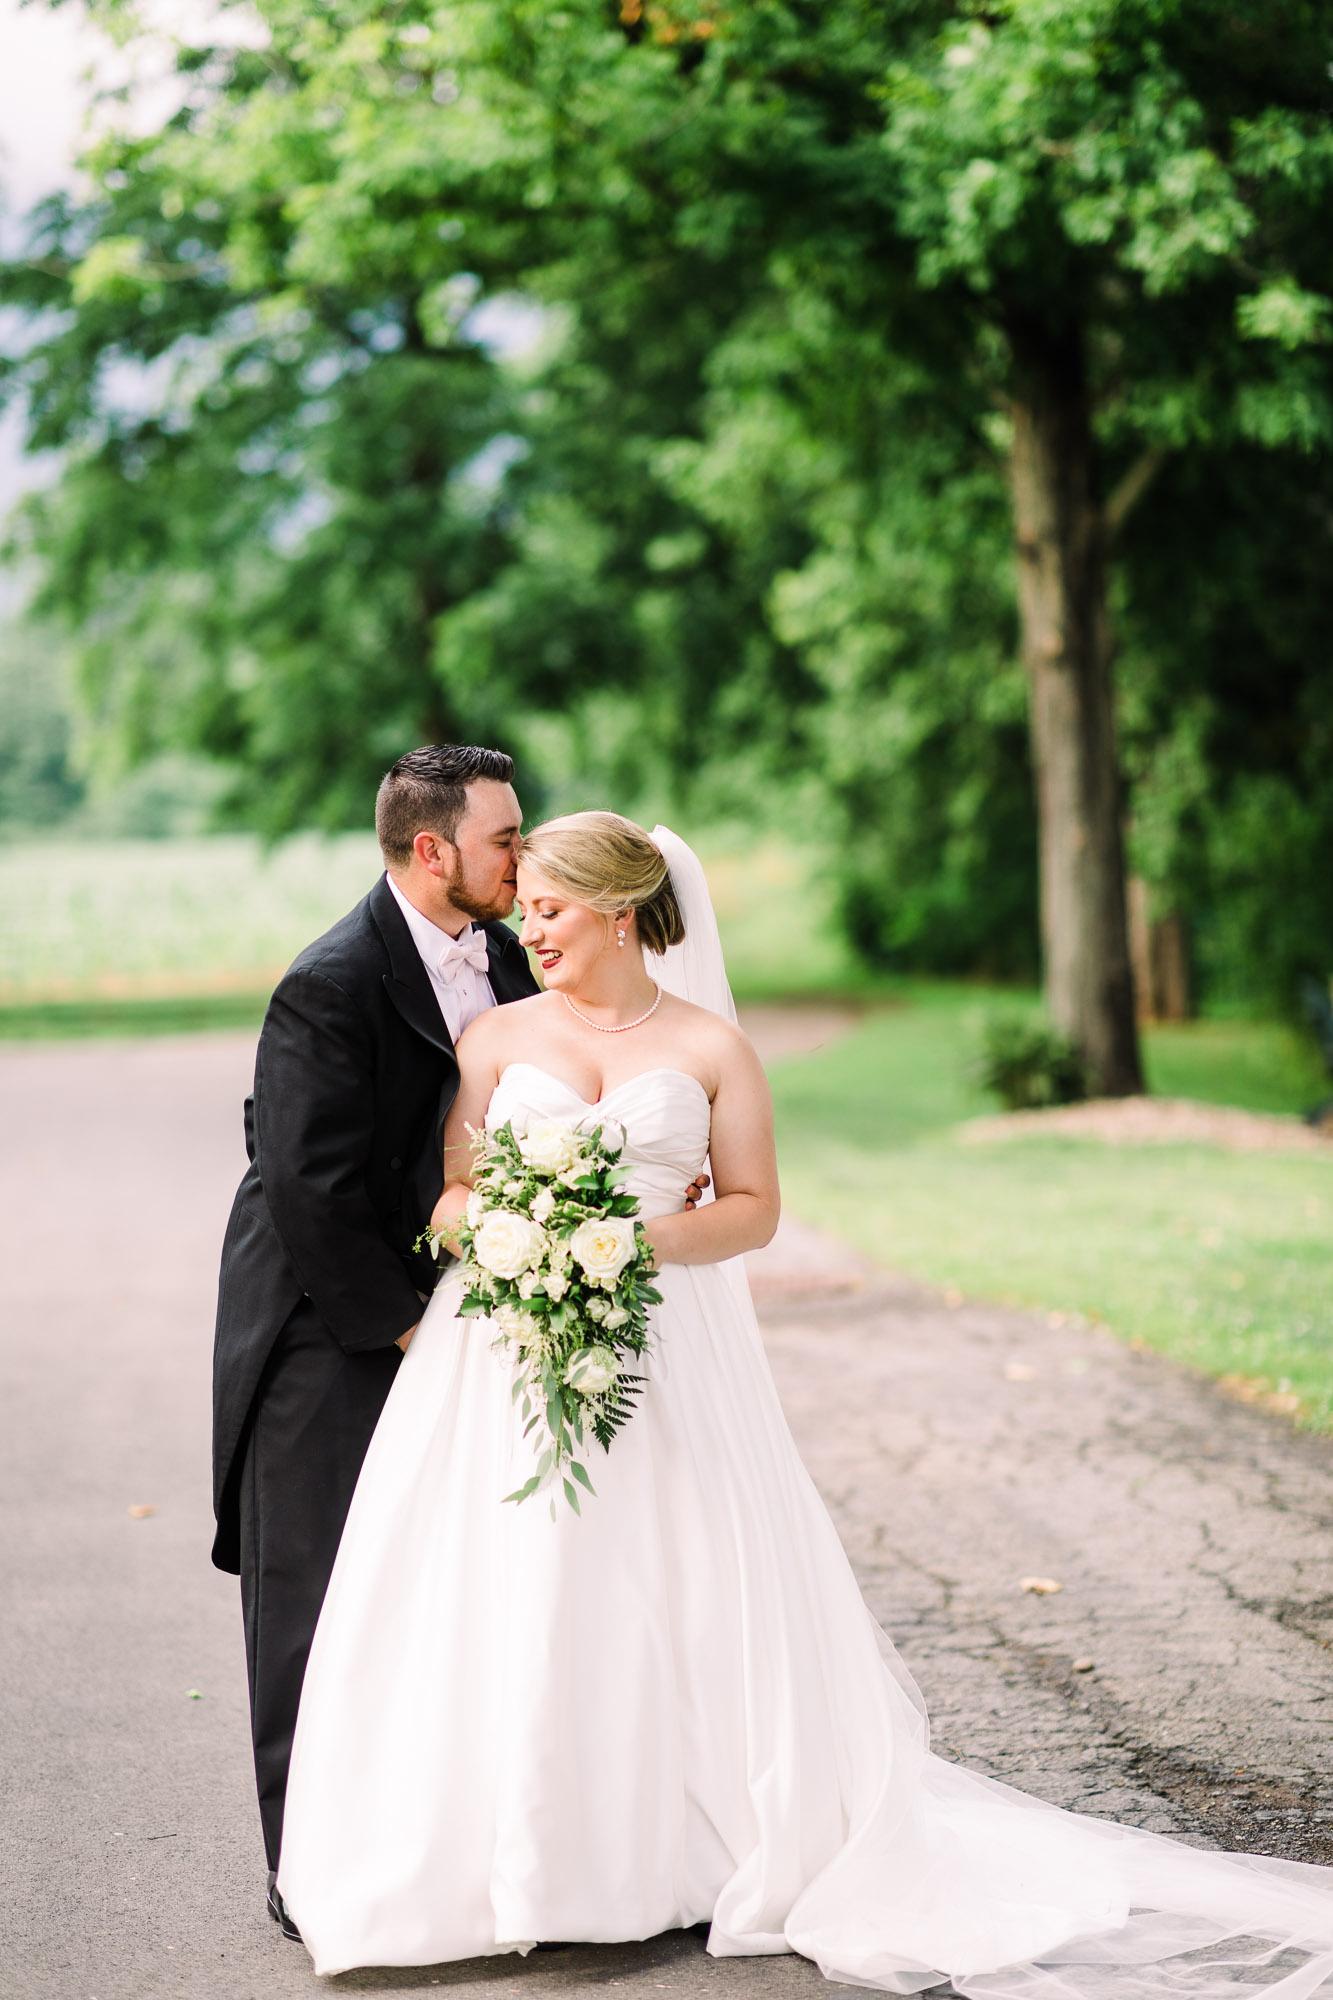 isle-of-que-wedding-4122.jpg